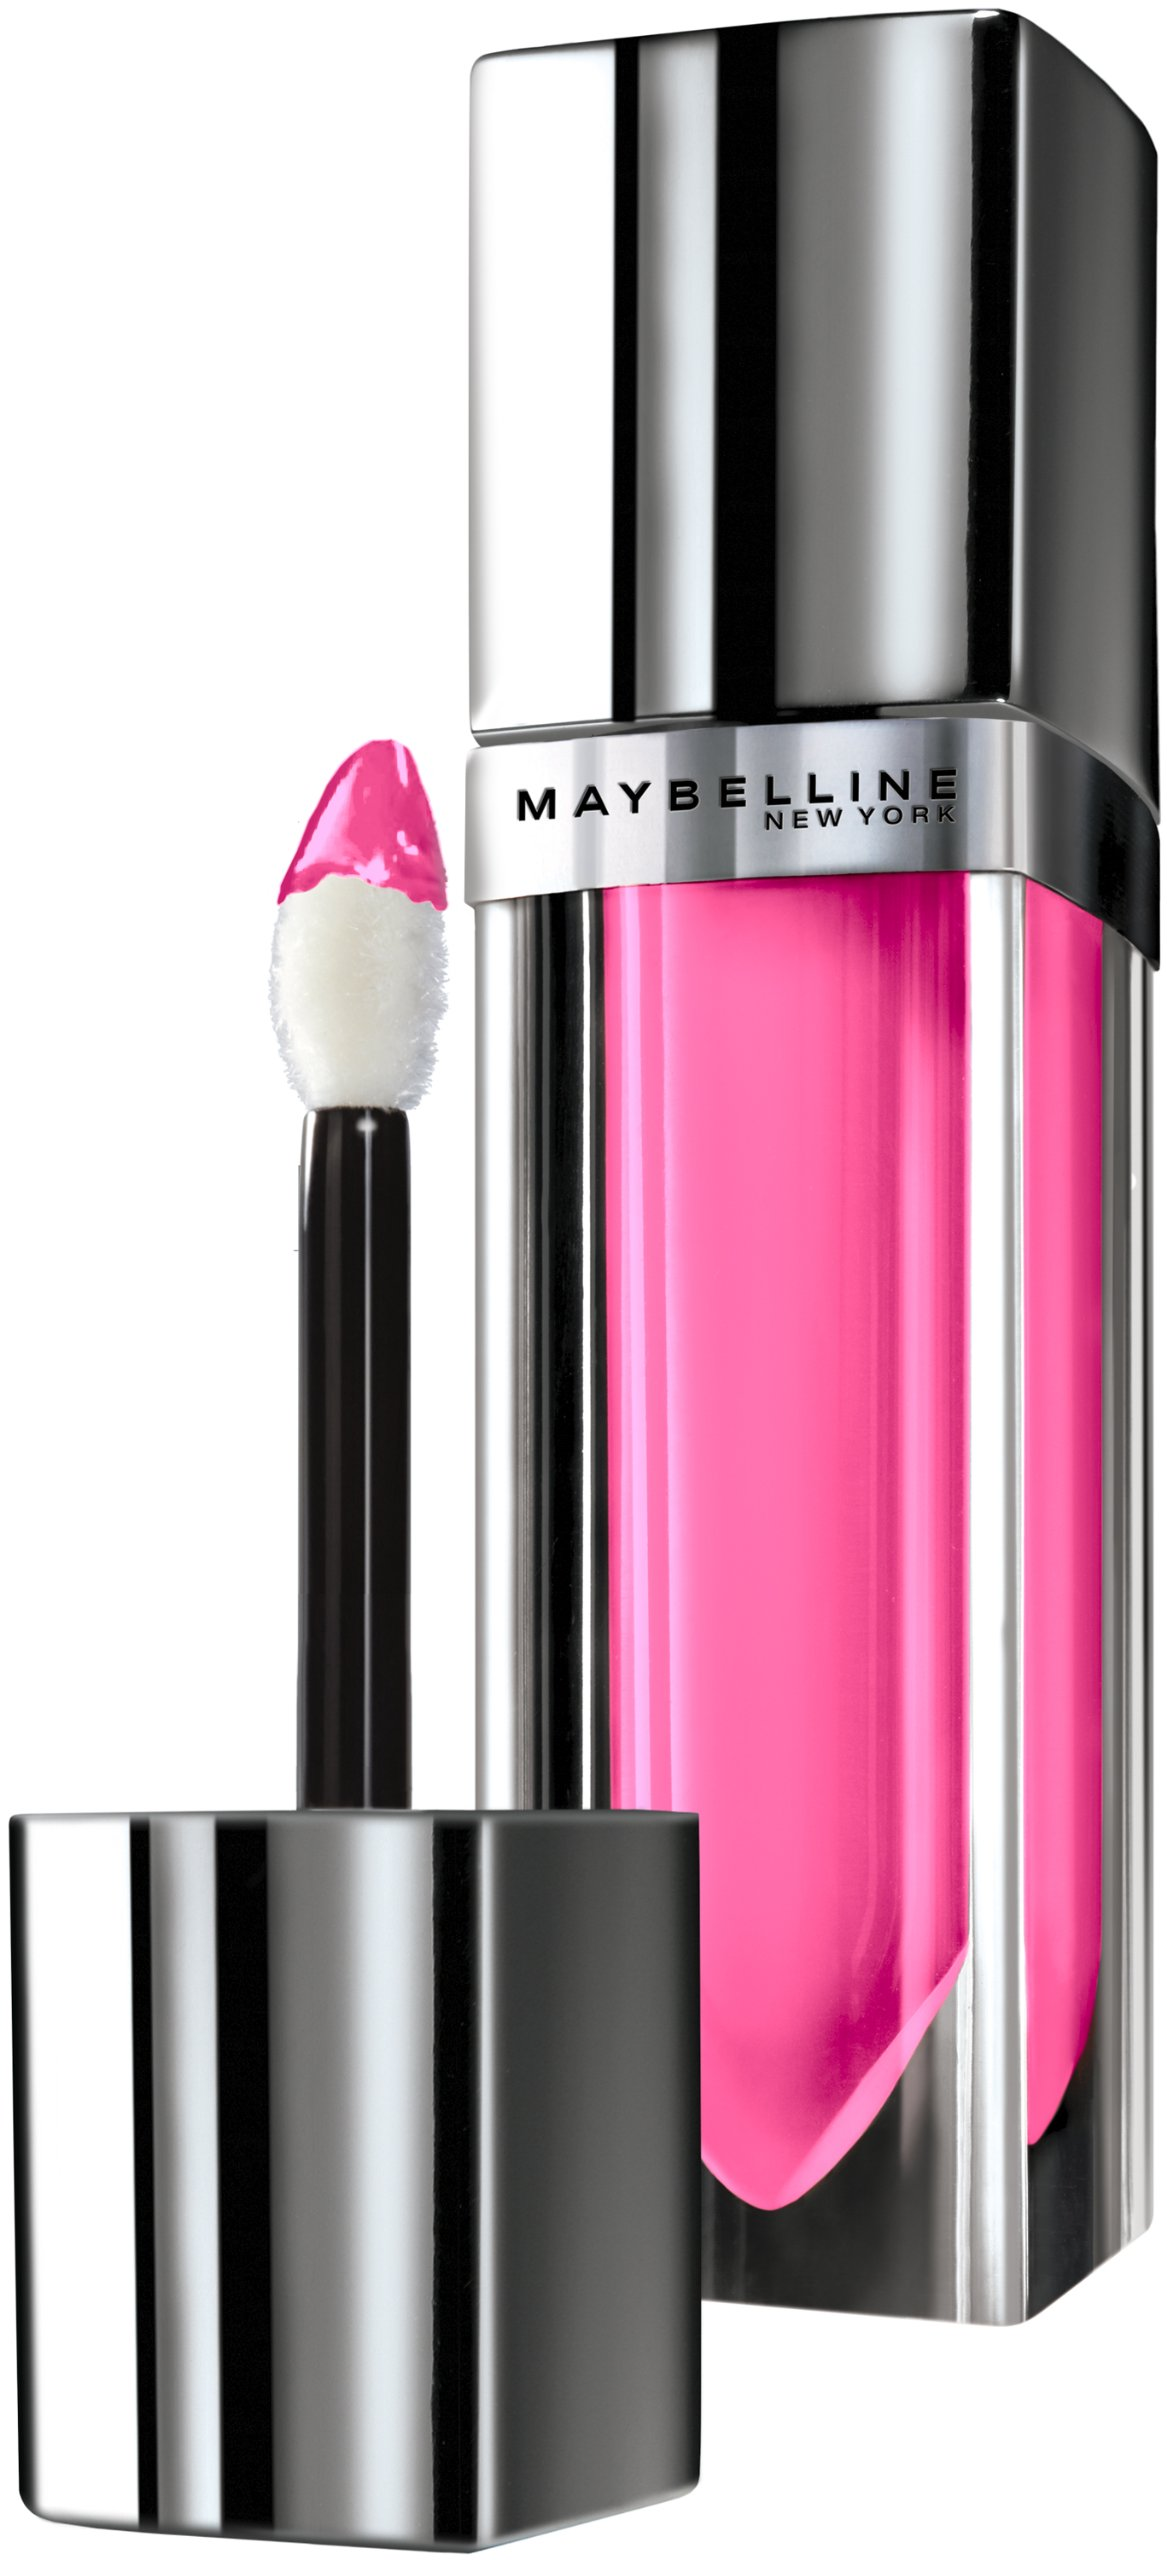 Maybelline New York Color Sensational Color Elixir Lip Color, Hibiscus Haven, 0.17 Fluid Ounce